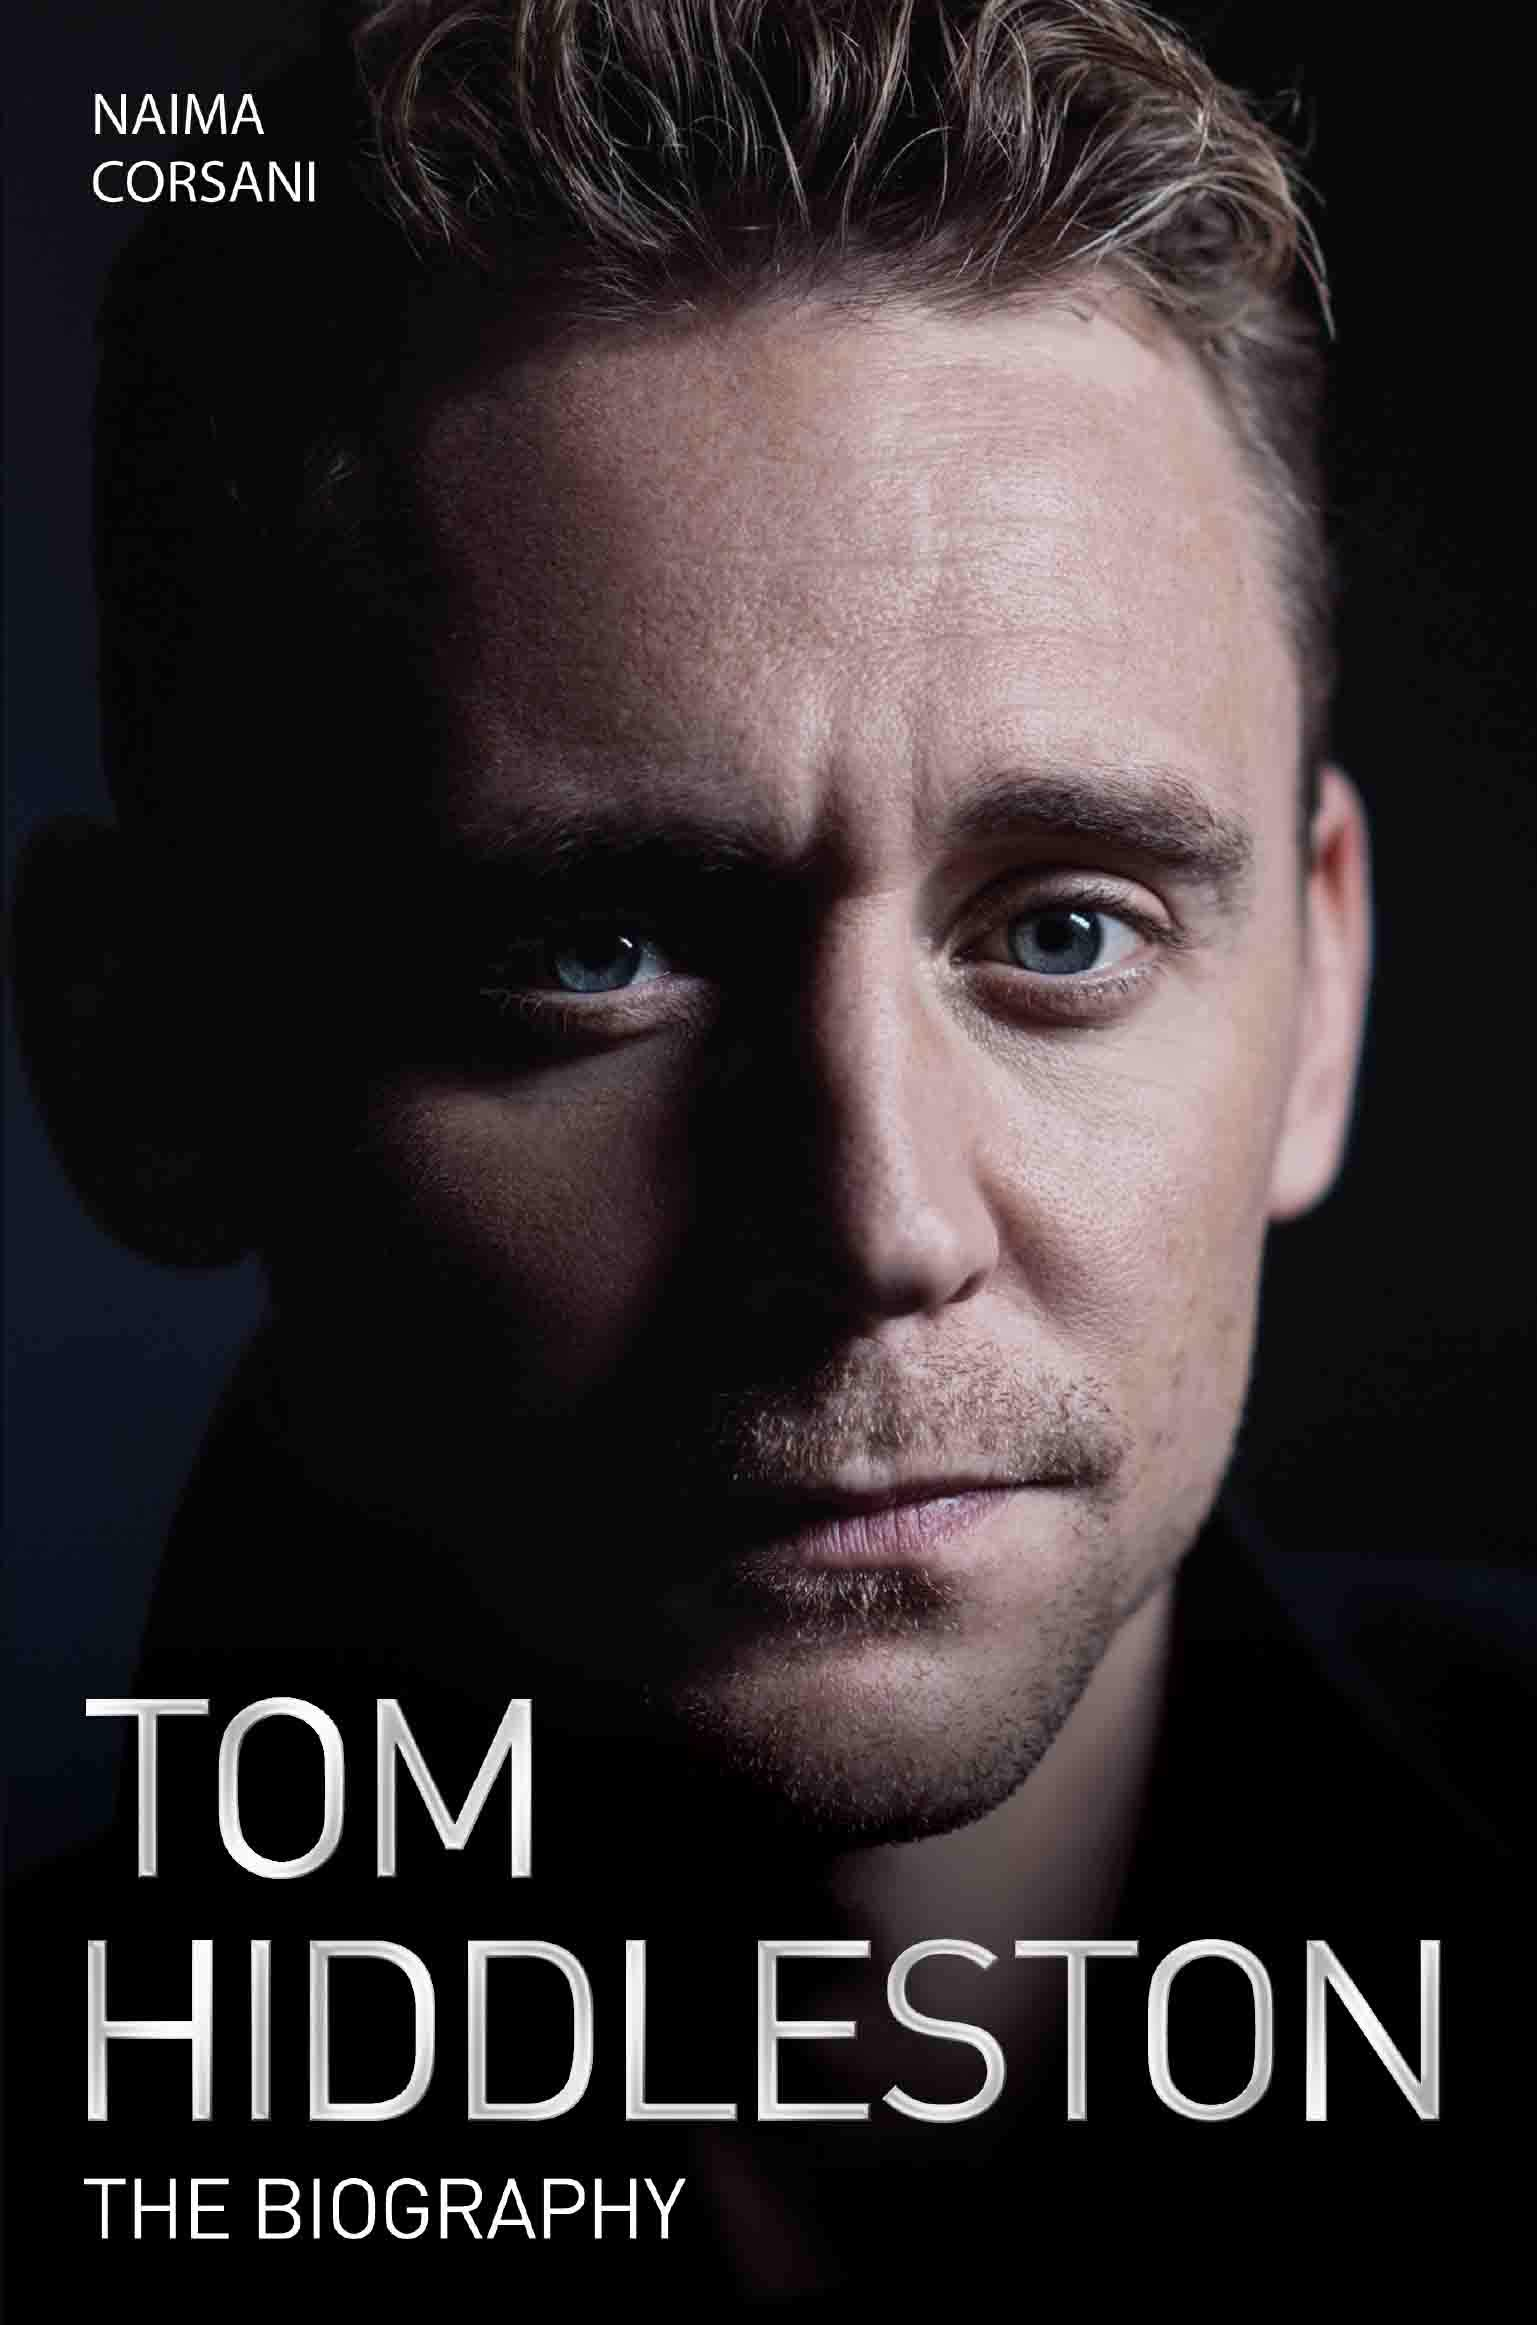 Amazon.com: Tom Hiddleston: The Biography (9781786062673 ...